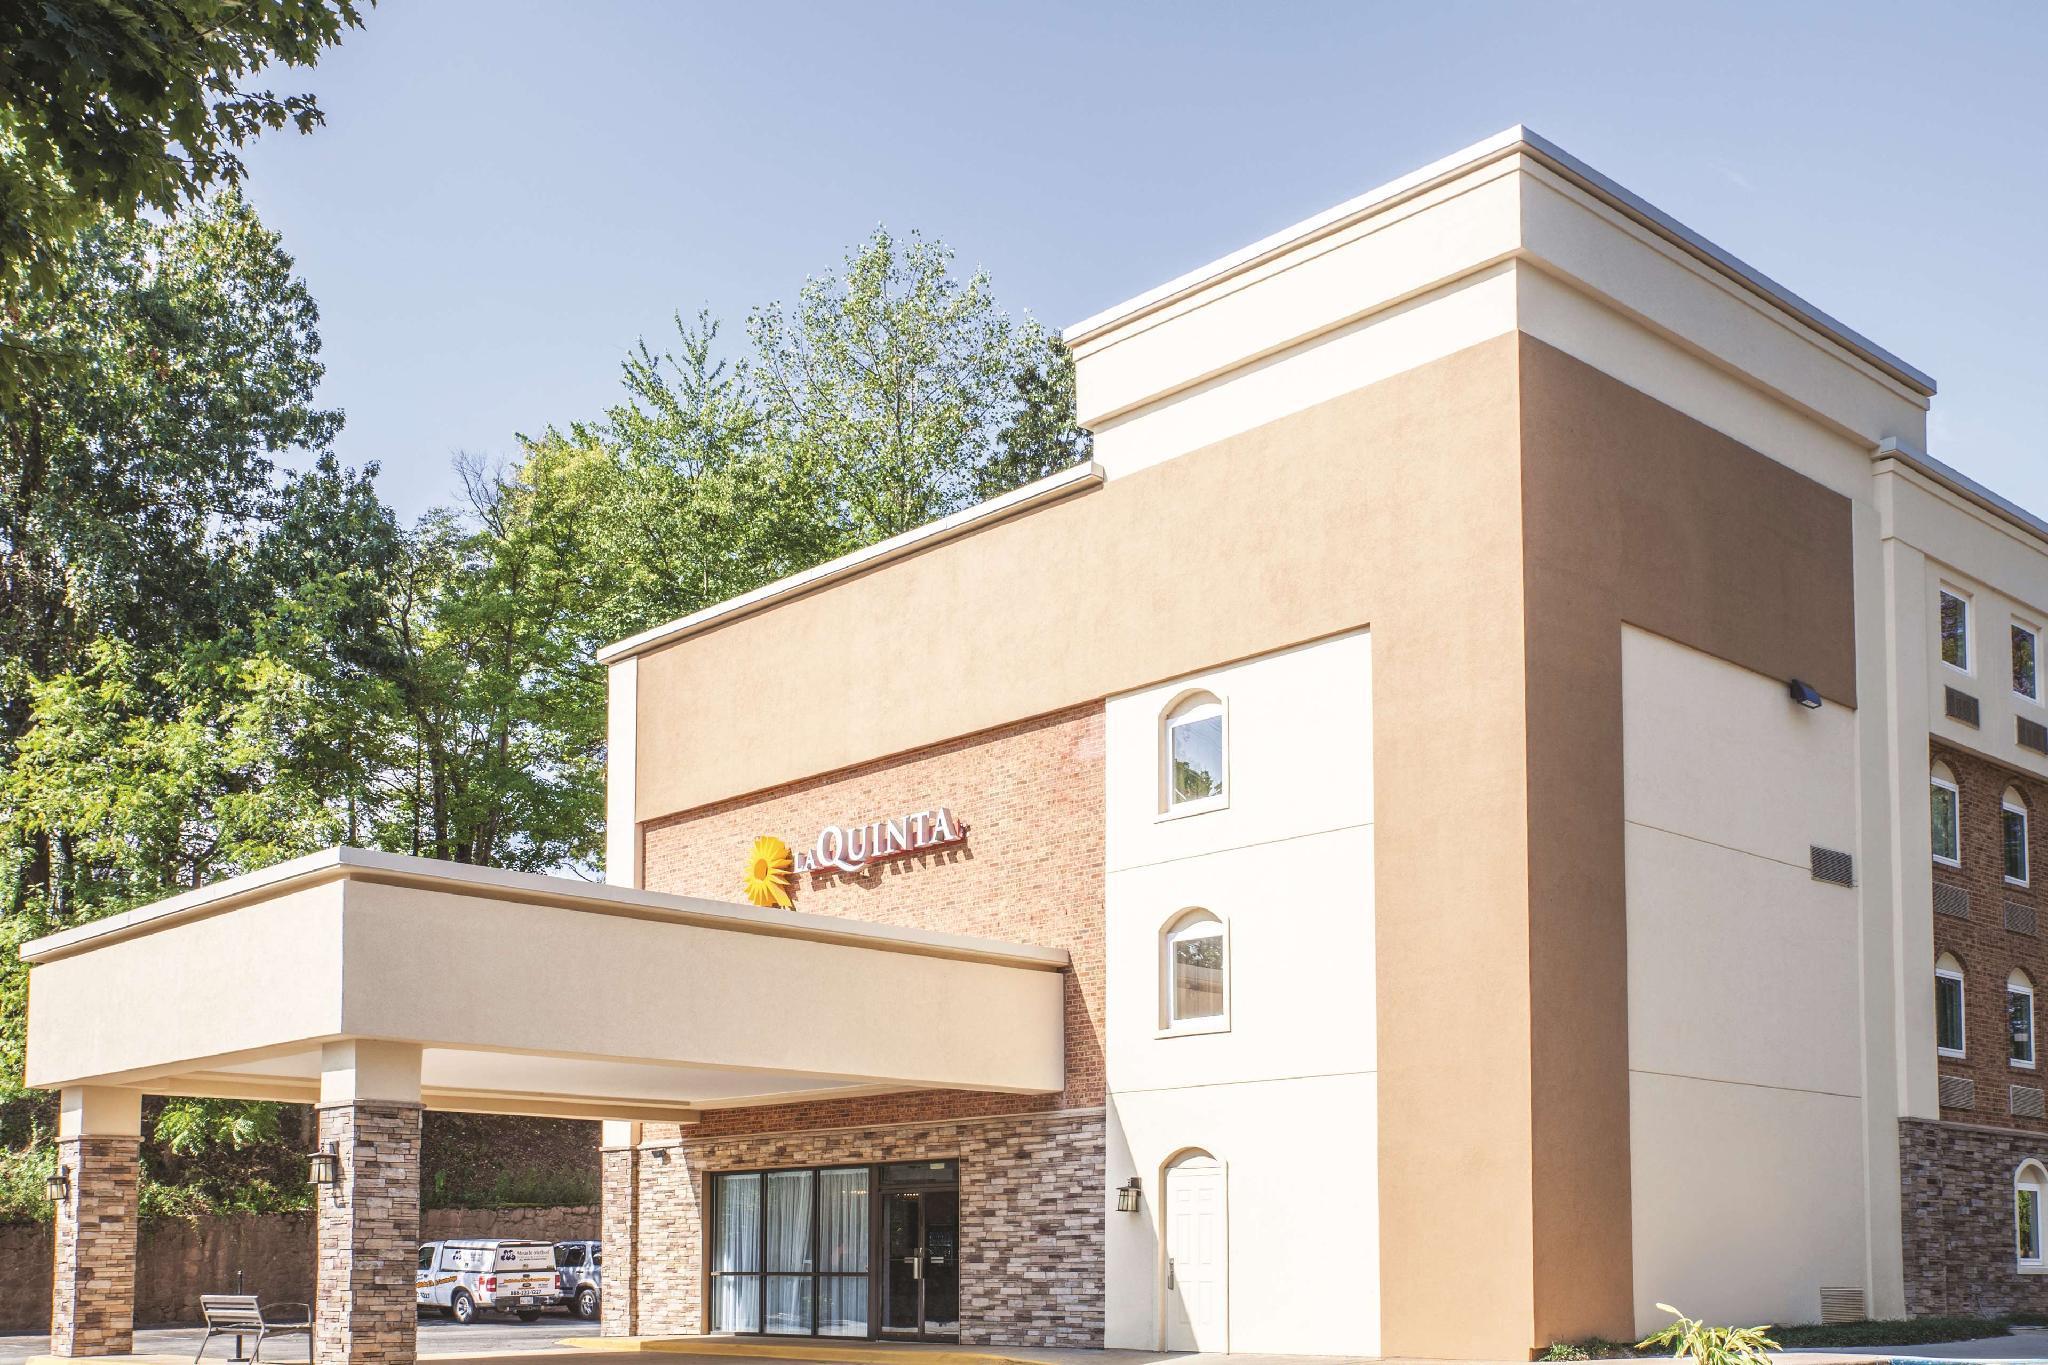 LA QUINTA INN SUITES CHARLOTTESVILLE UVA-MEDICAL, Charlottesville